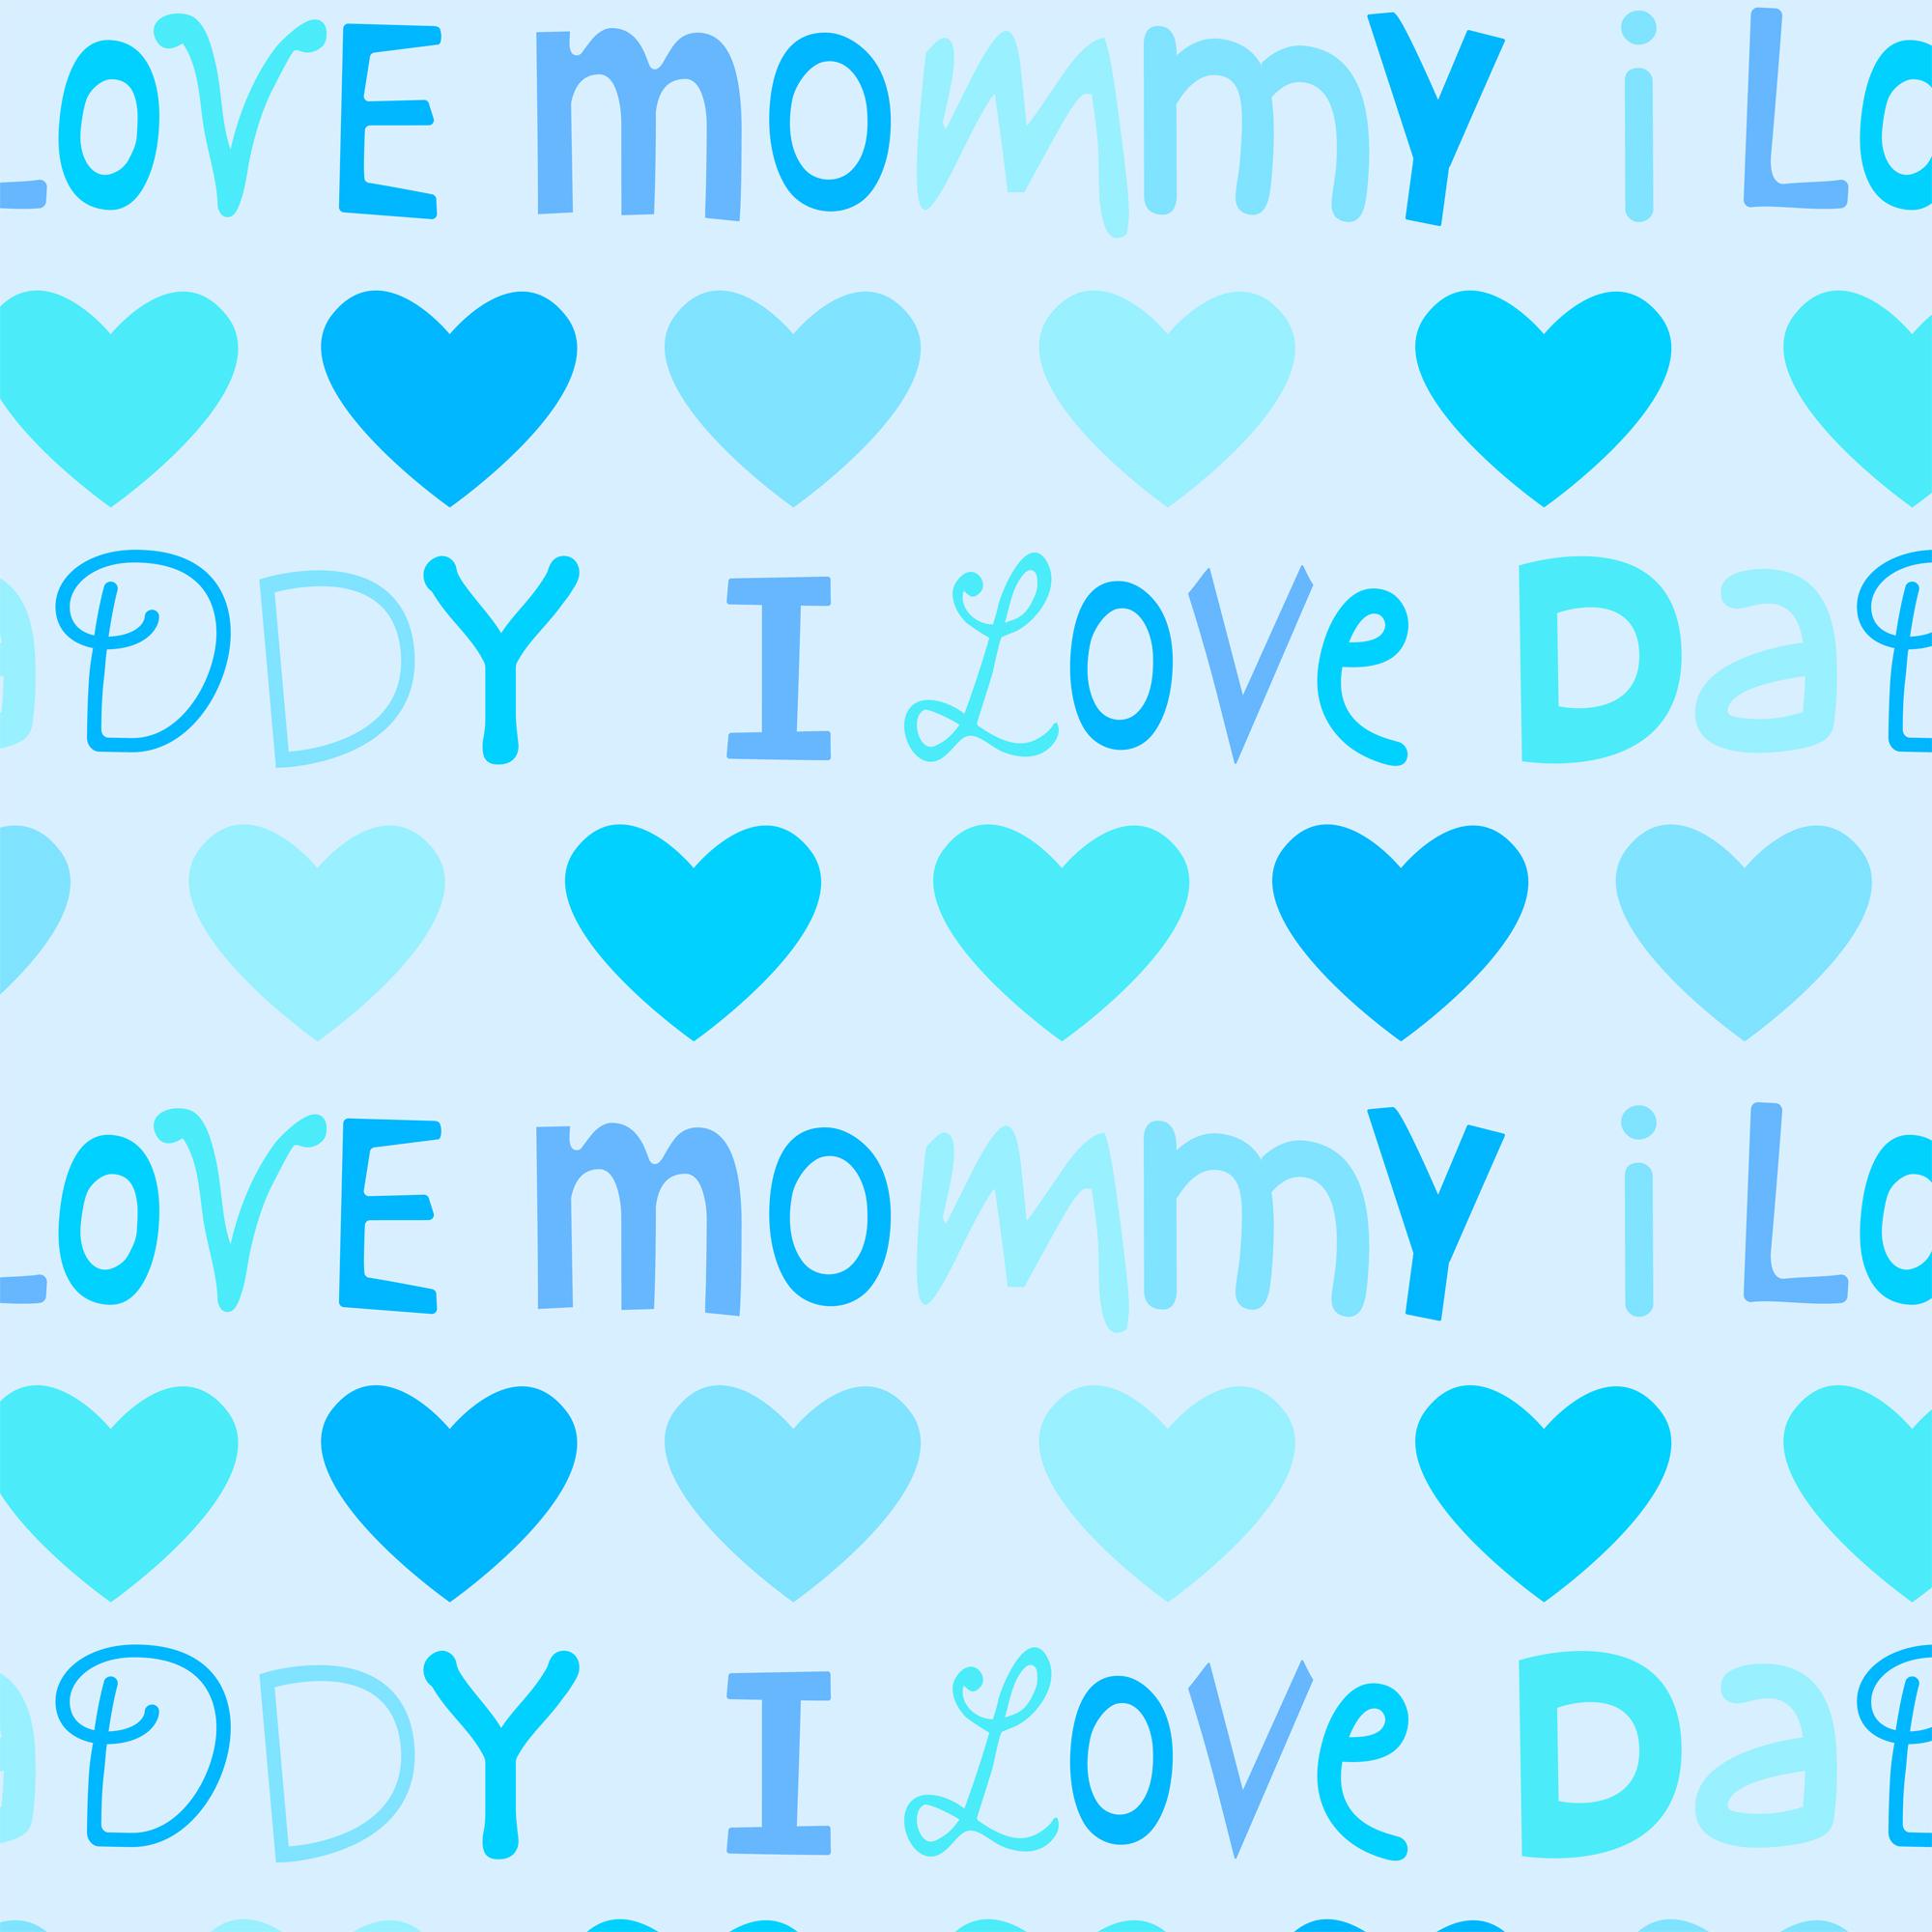 David Textiles, Inc. FABRIC CUT FLEECE LOVE MOM DAD BLUE 1.5 YARD